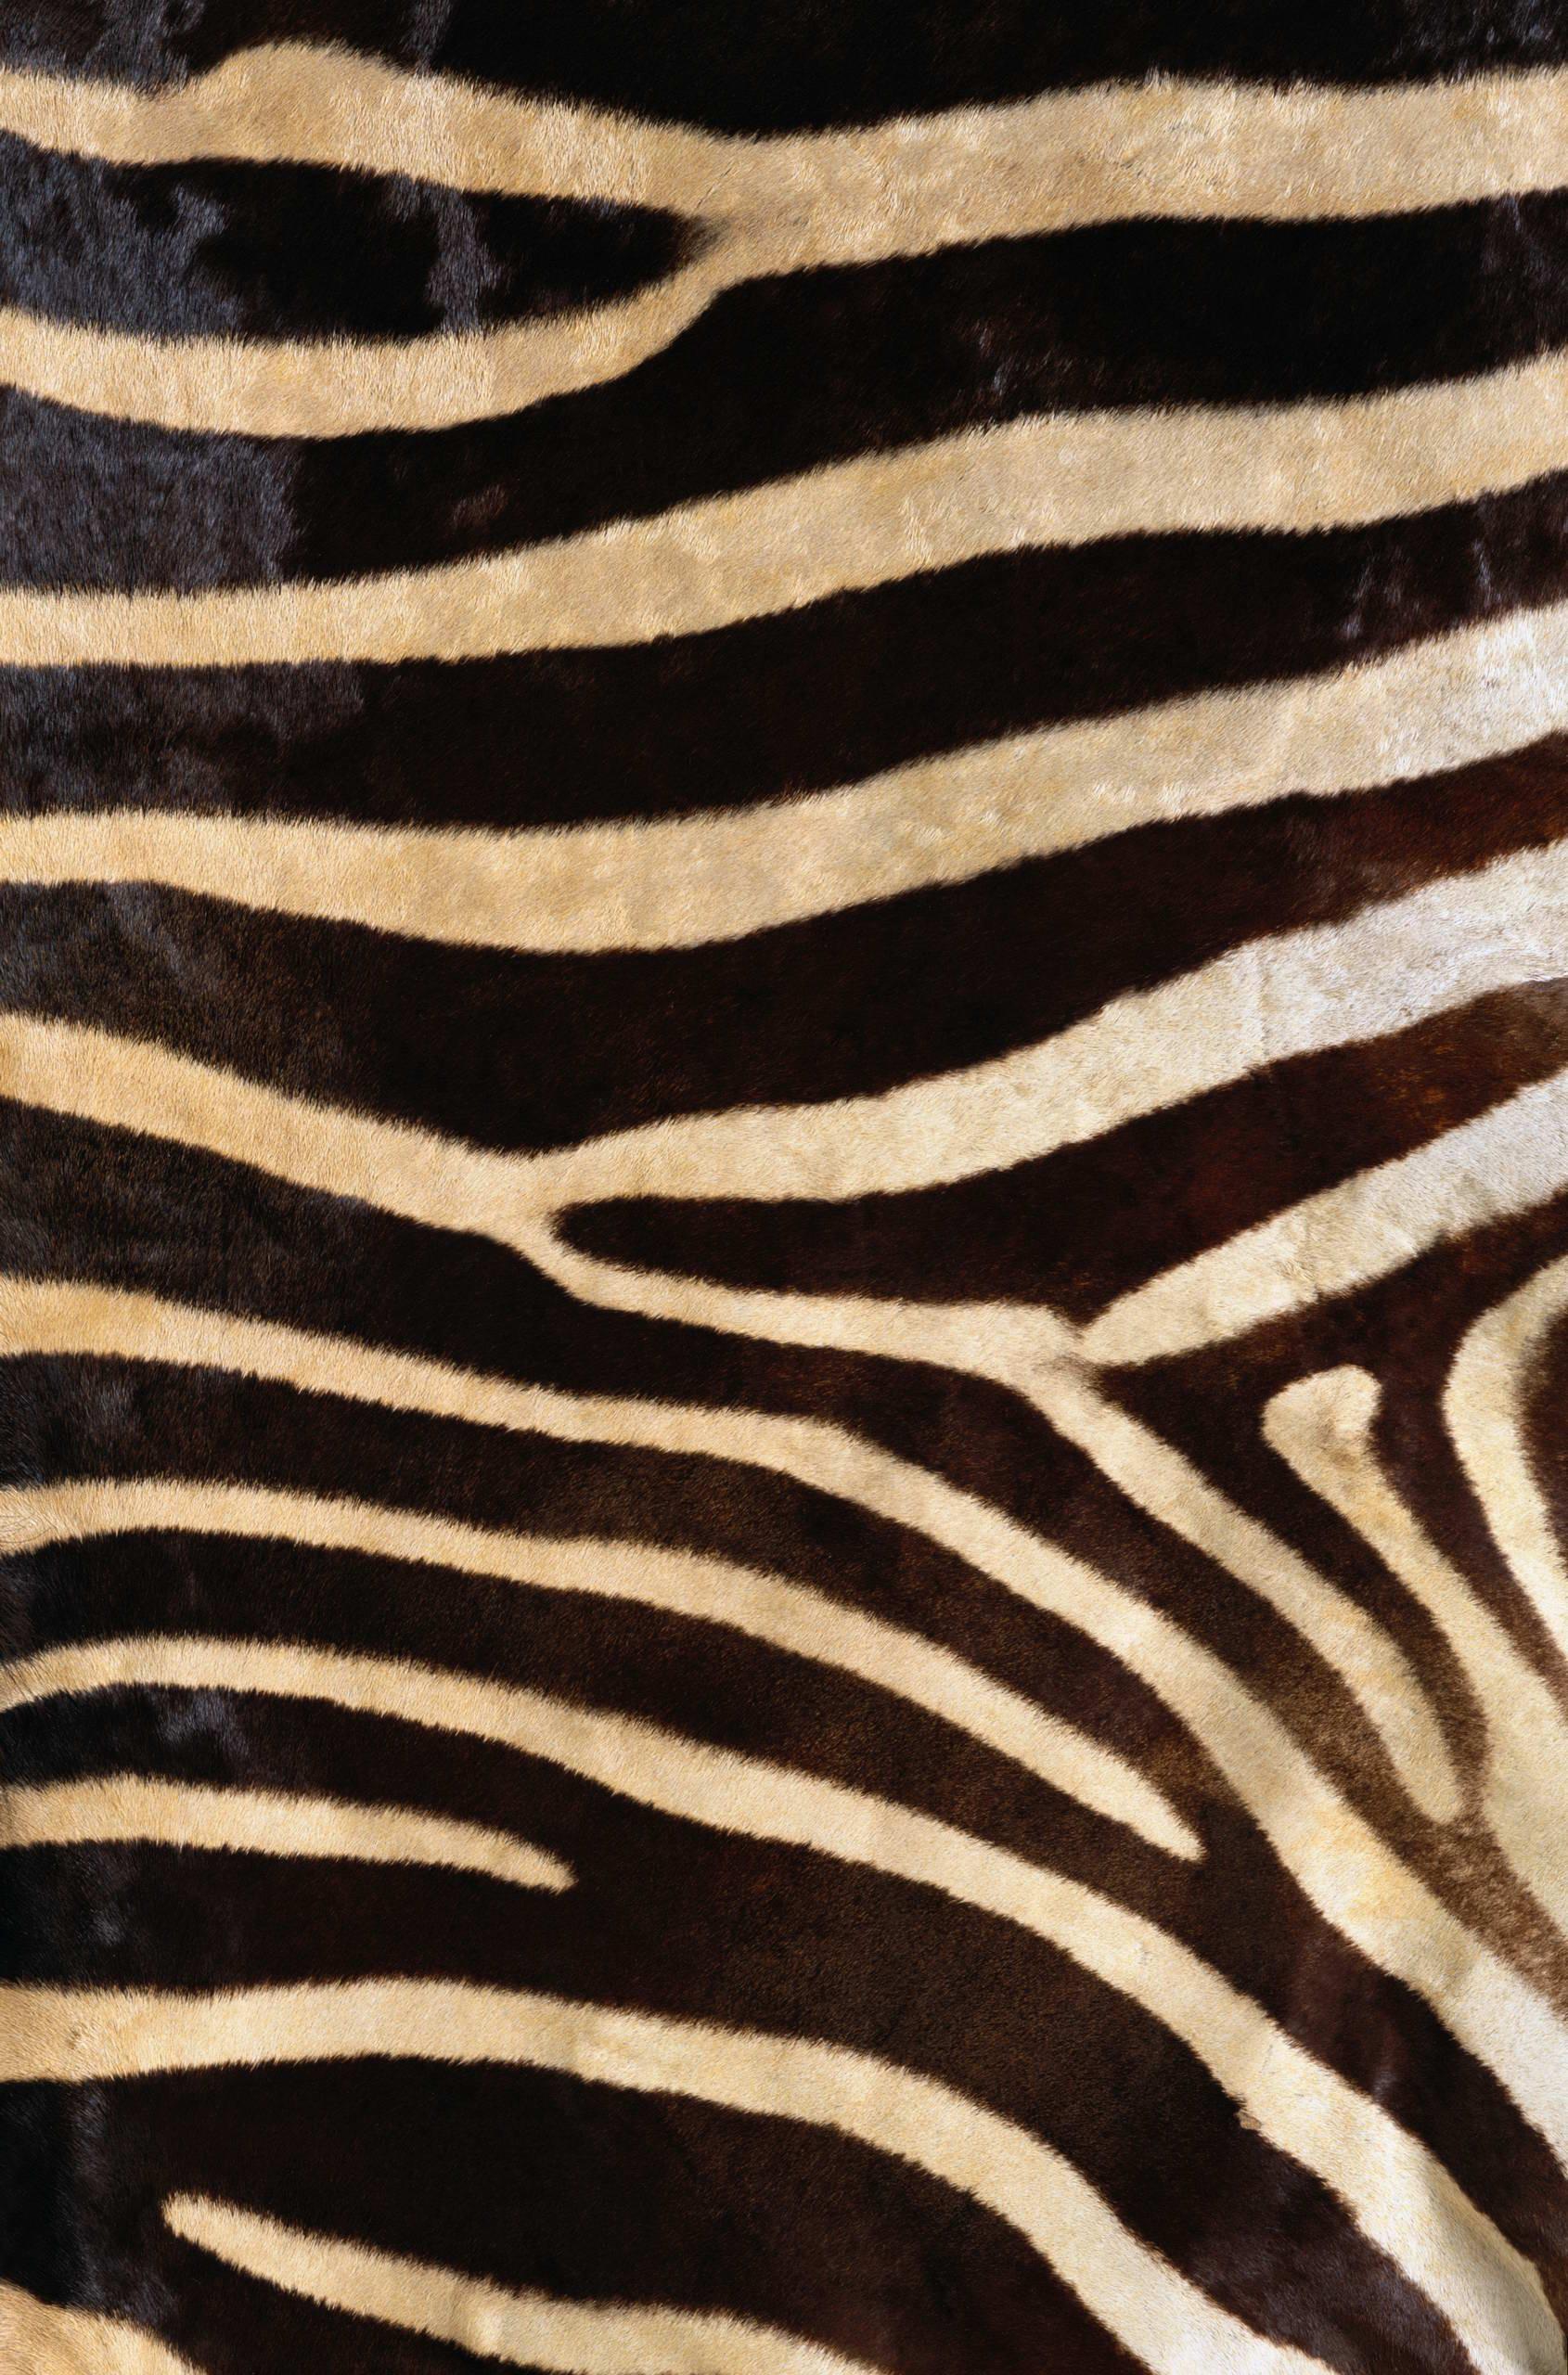 zebra background 183�� download free stunning hd wallpapers